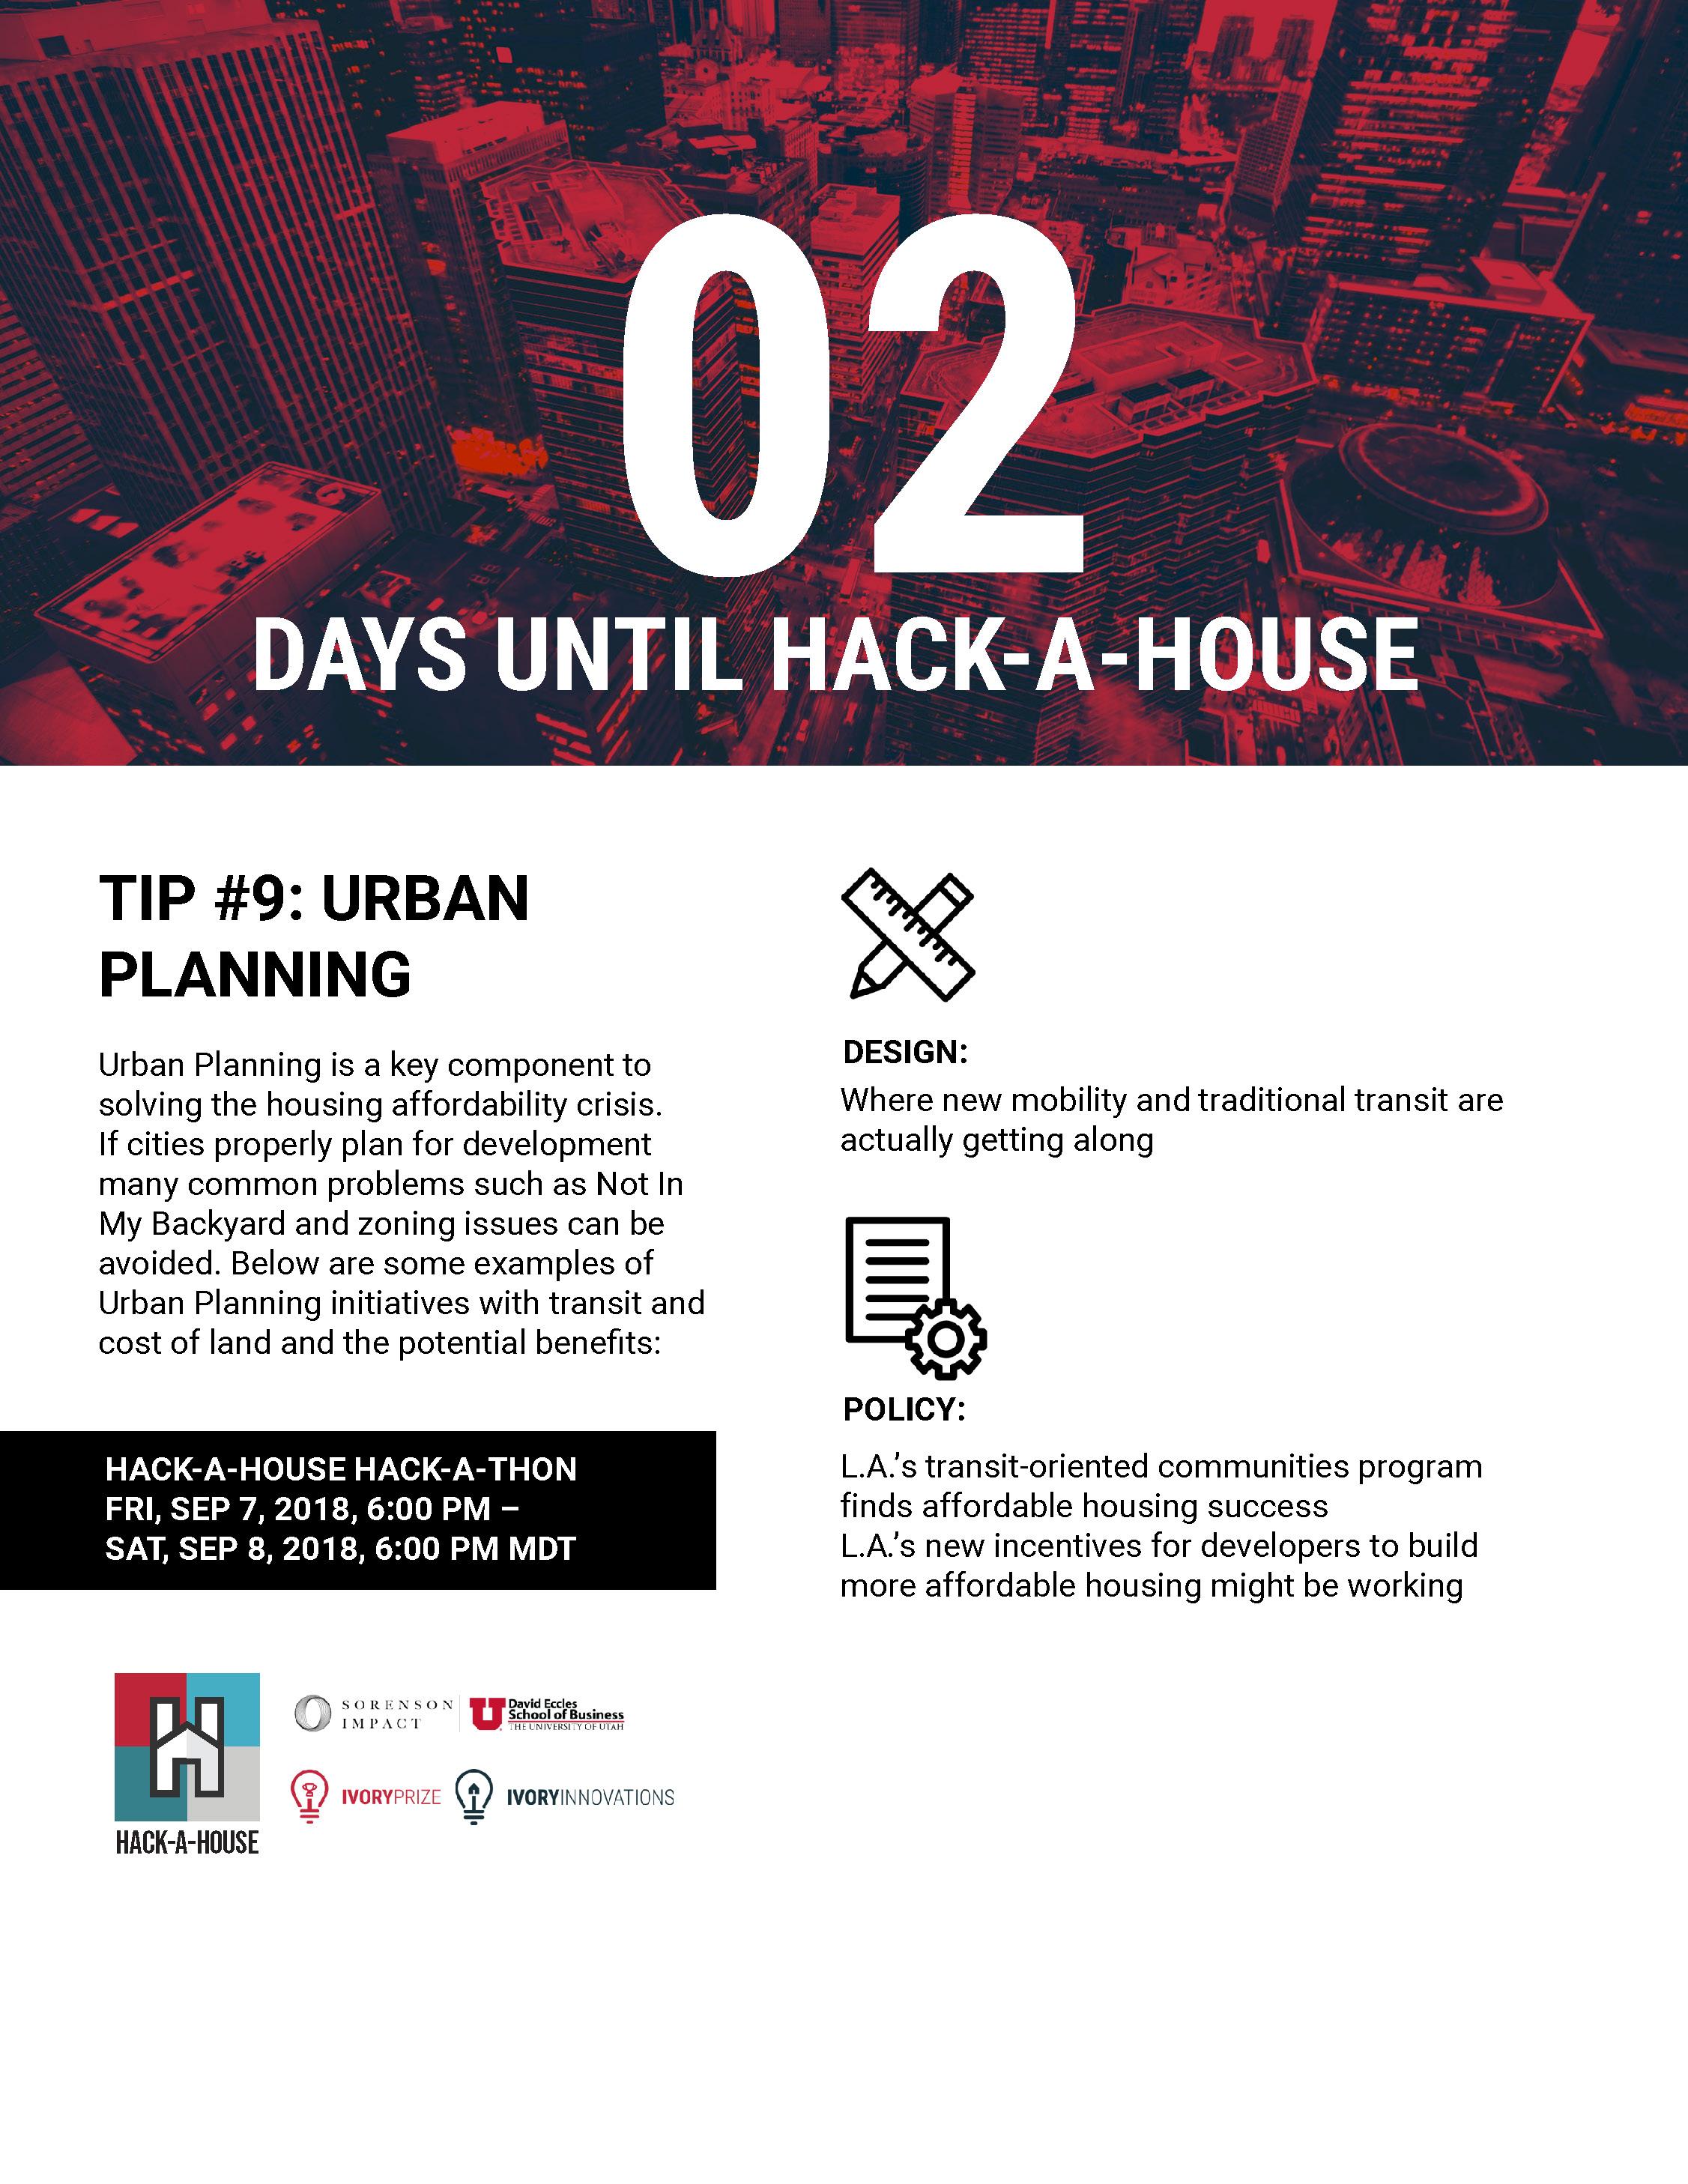 hack-a-house countdown_09.jpg